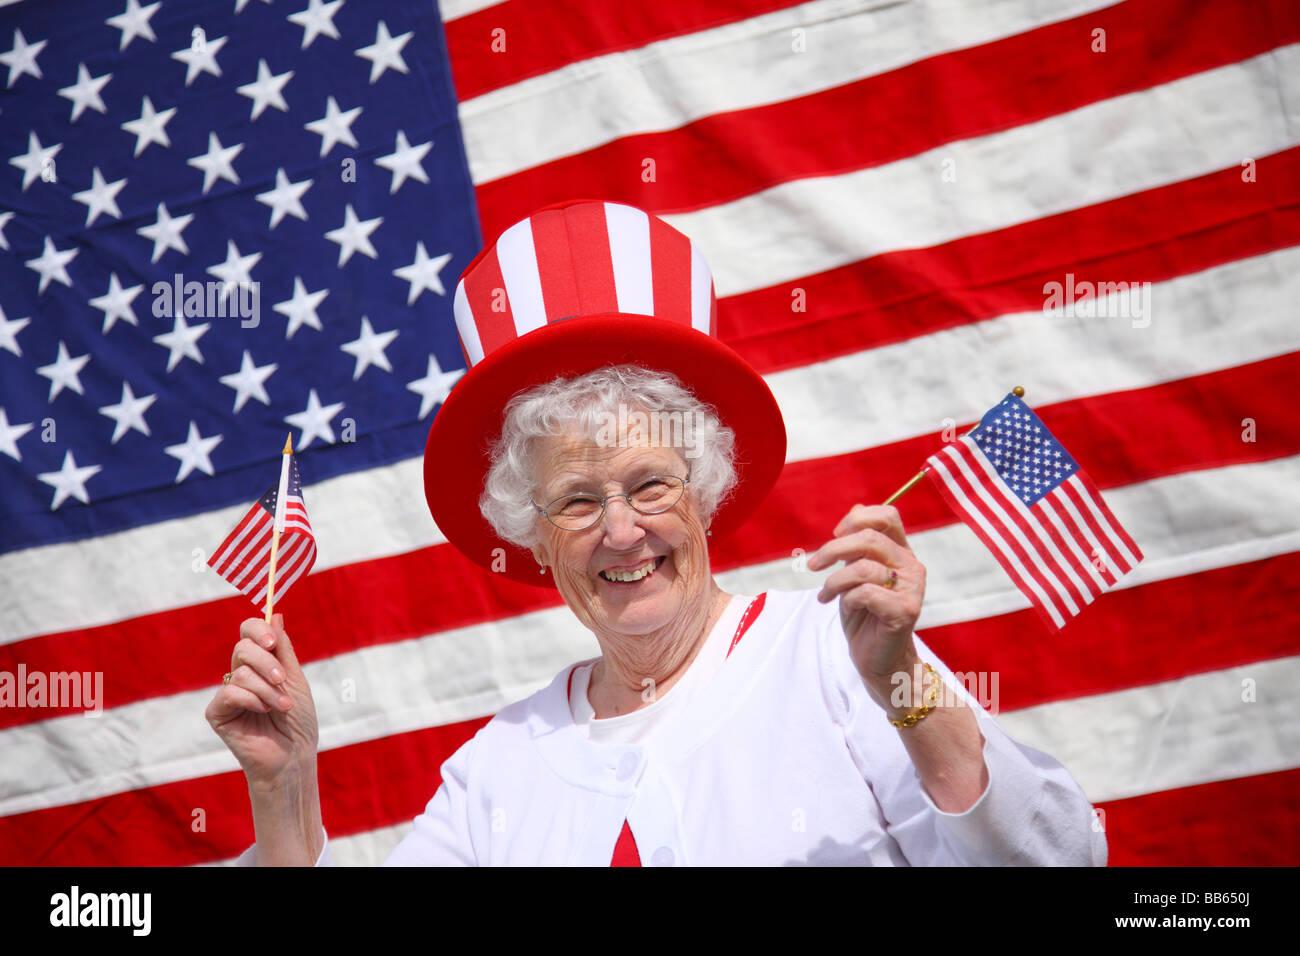 Patriotic senior woman waving flags and smiling - Stock Image